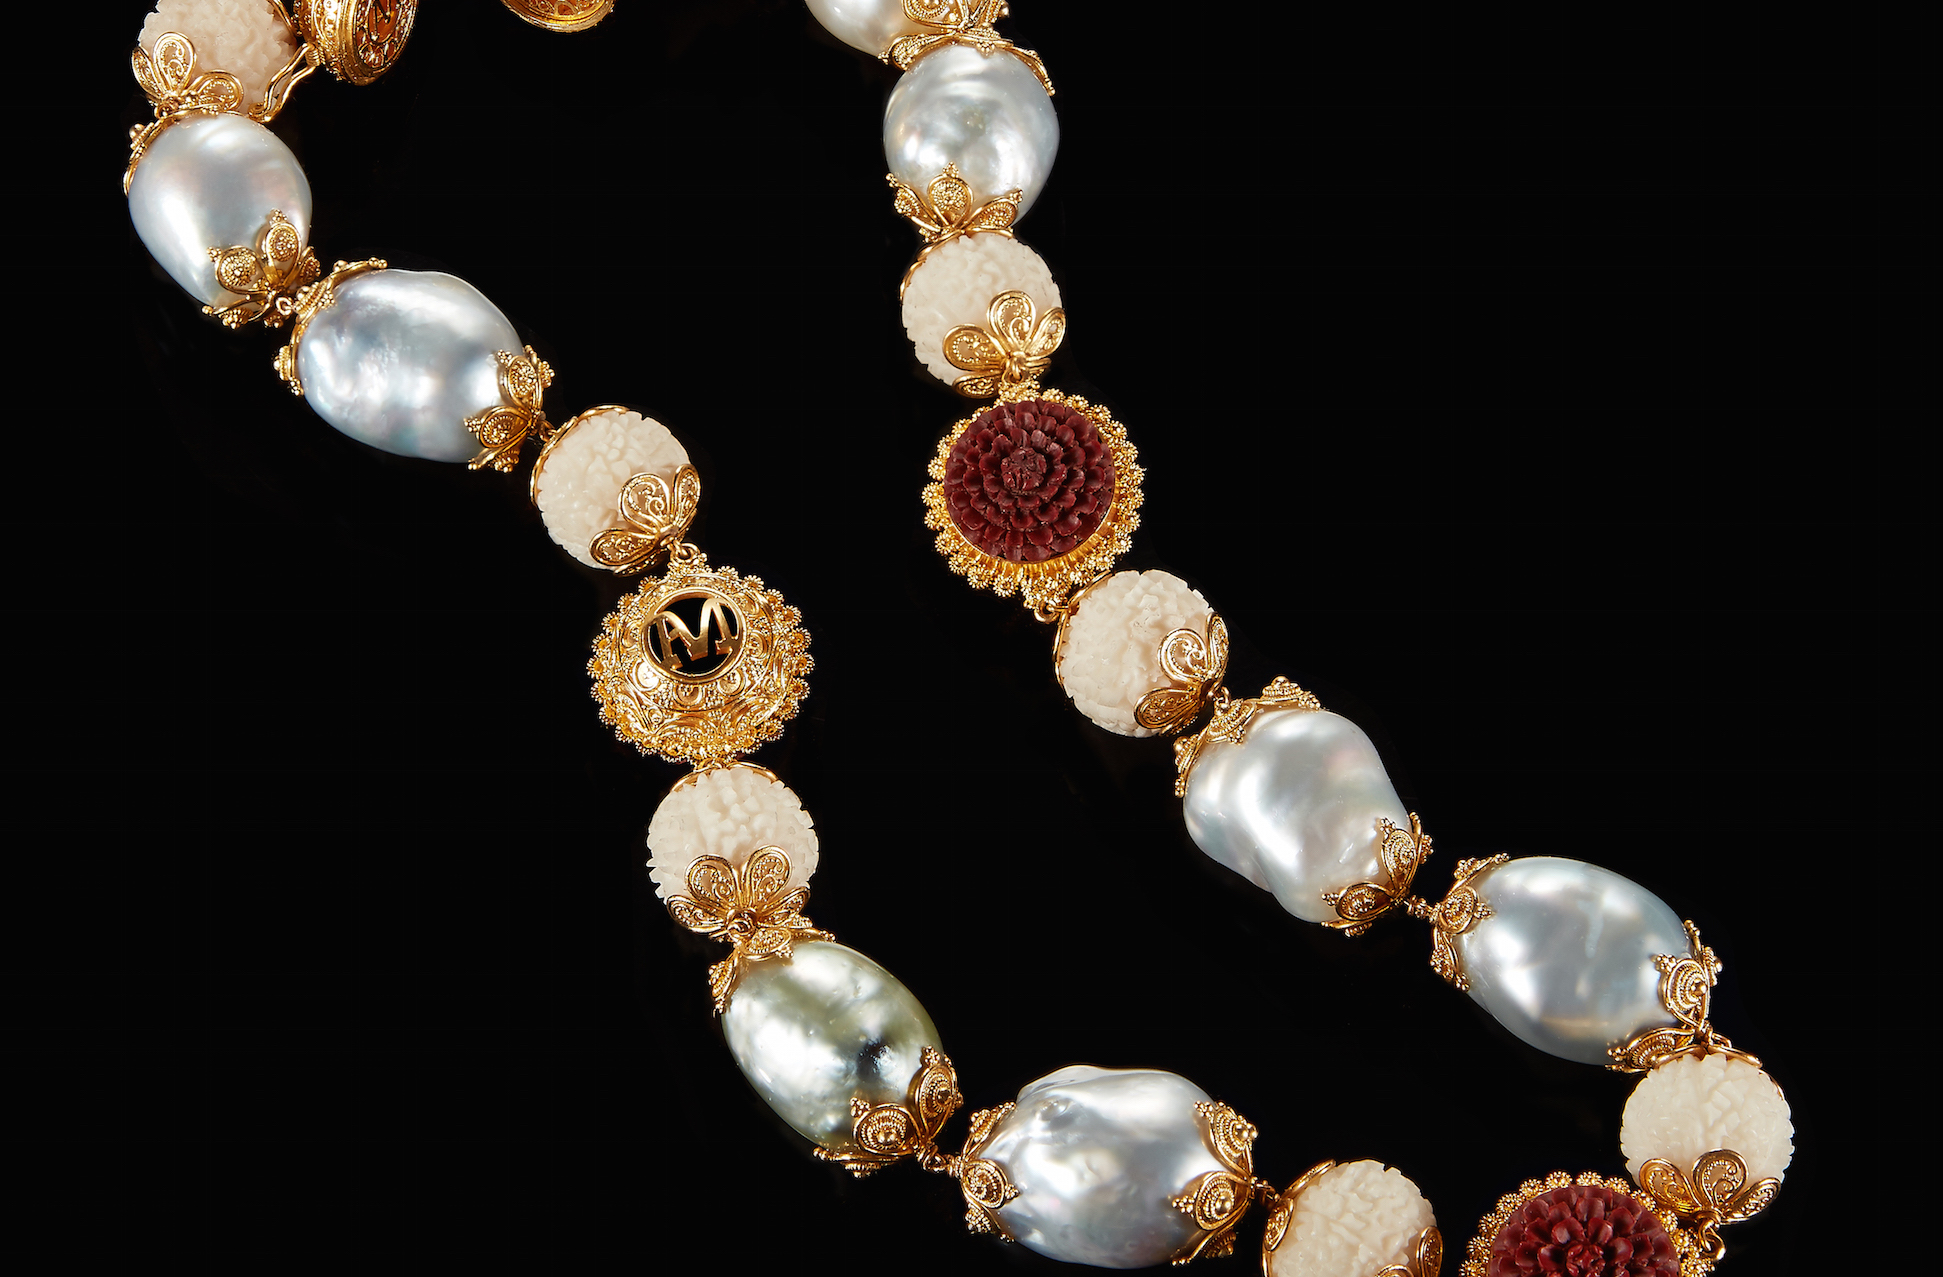 Red tagua long brooch tagua nut jewelry pearl gold brooch